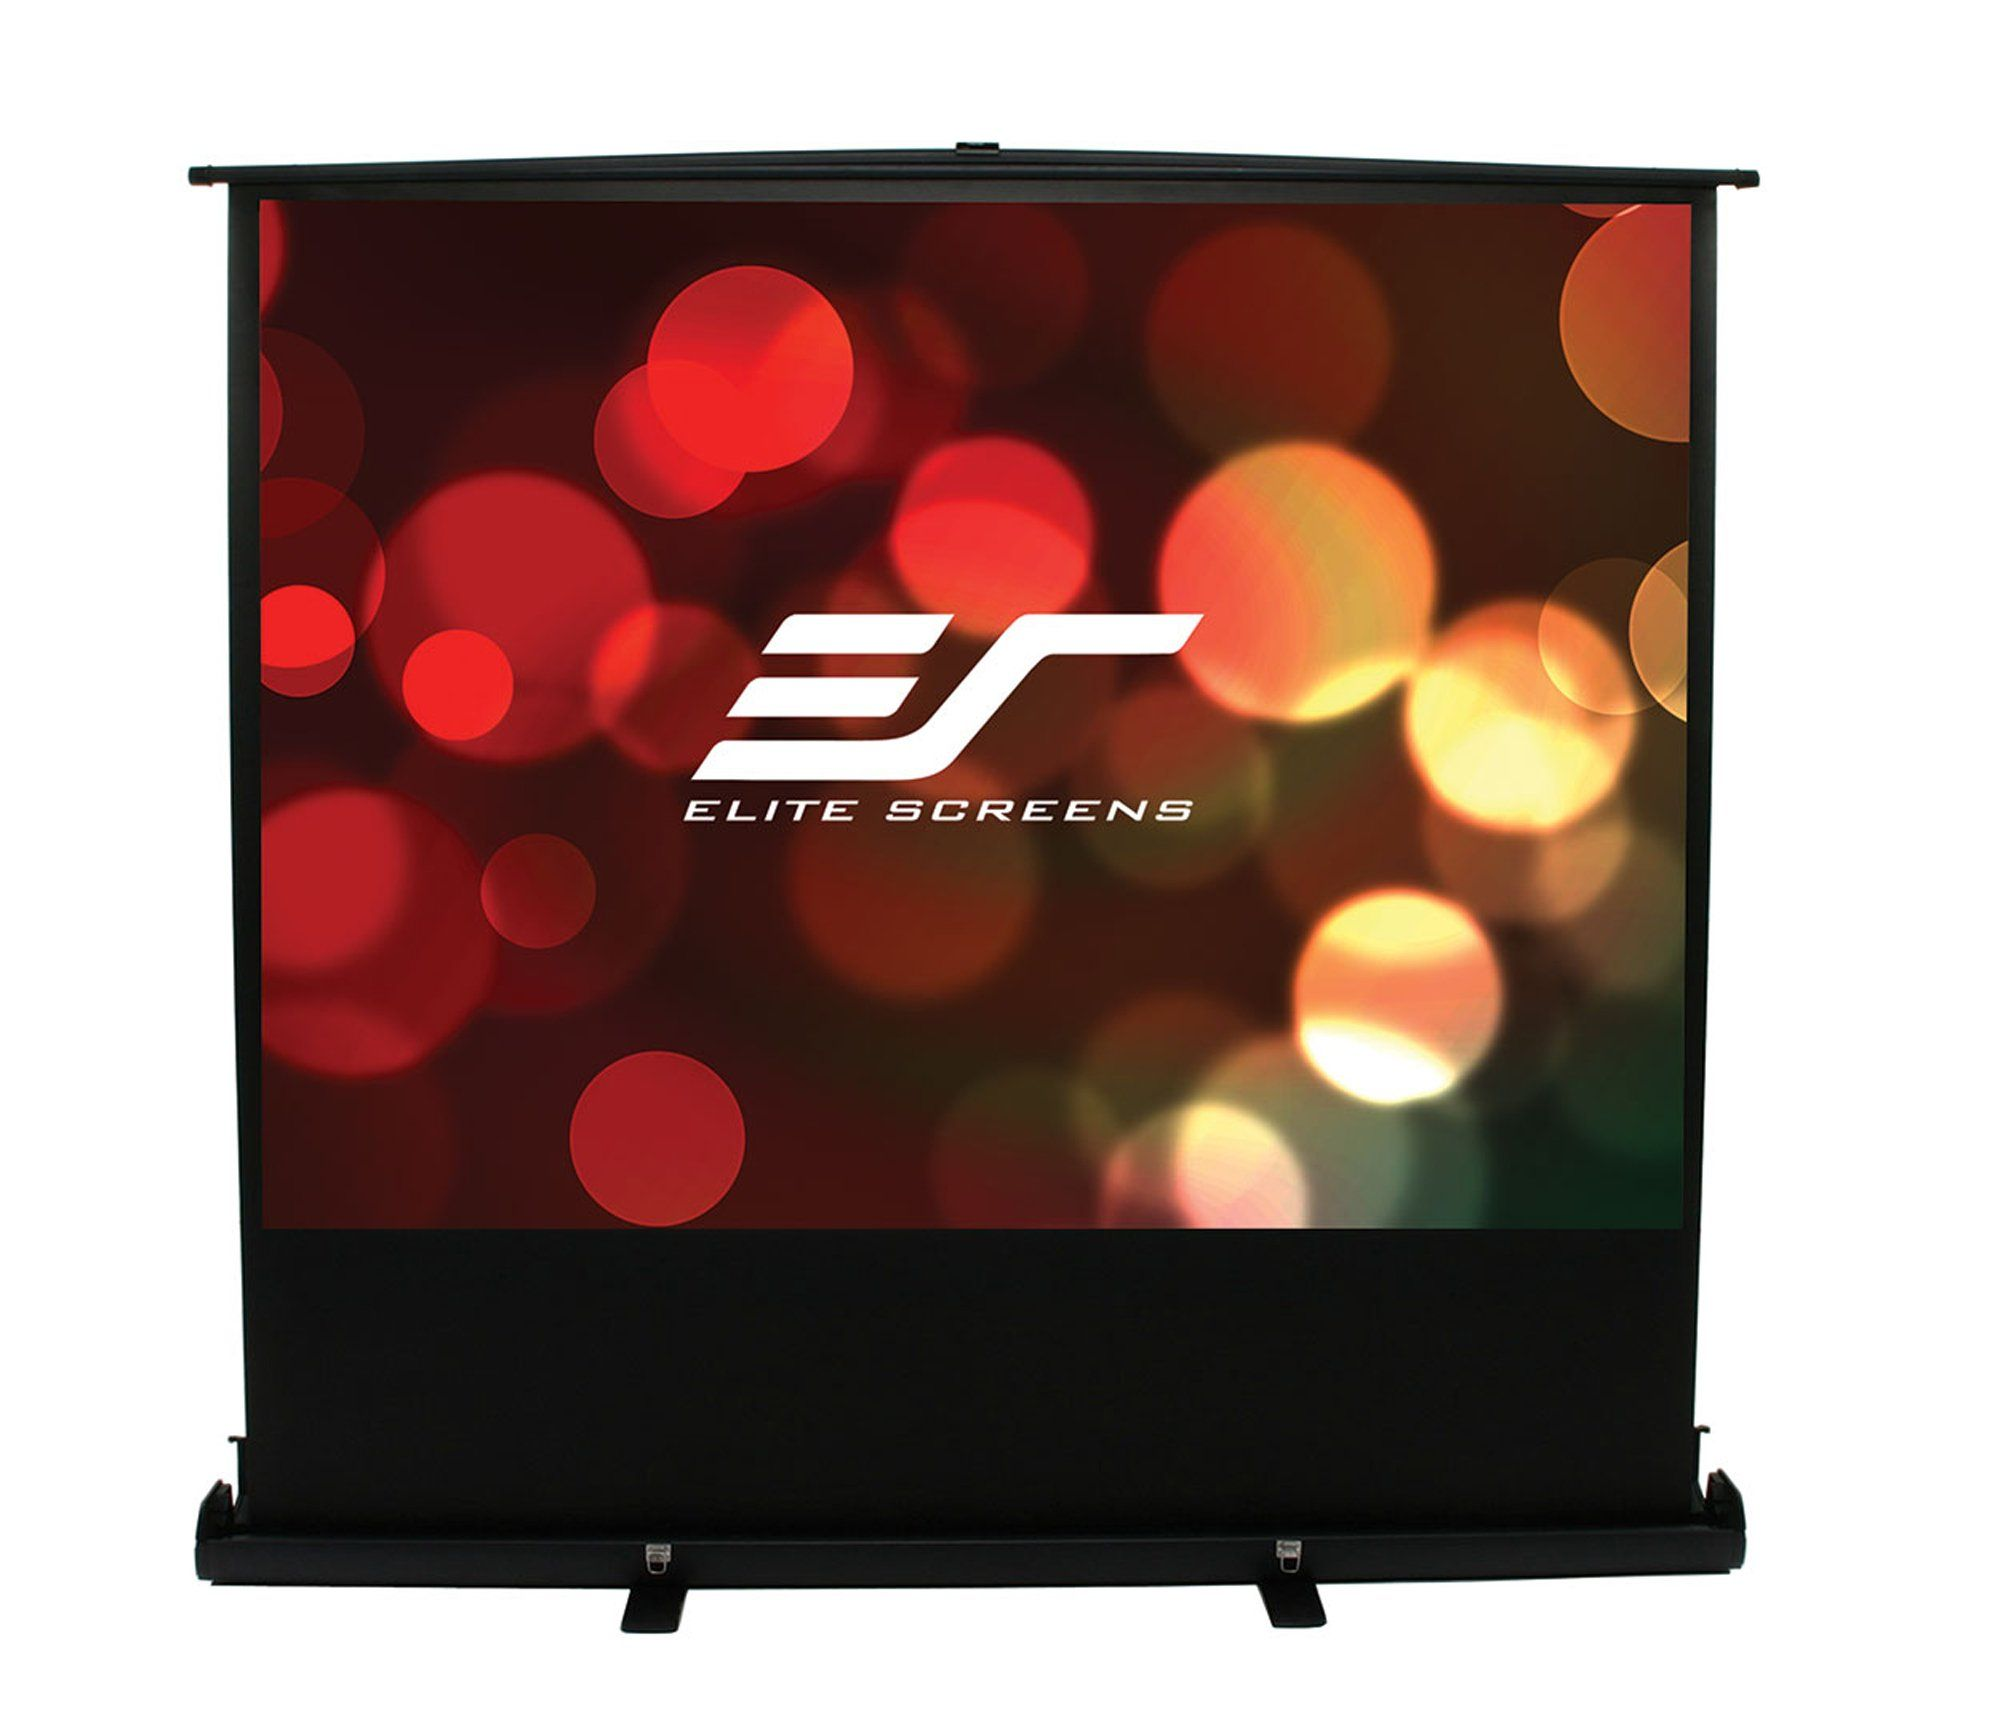 Elite Screens Ezcinema Plus Series 100 Inch Diagonal 16 9 Floor Pull Up Portable Projection Screen Model F100xwh1 Projection Screen Outdoor Screens Outdoor Movie Screen